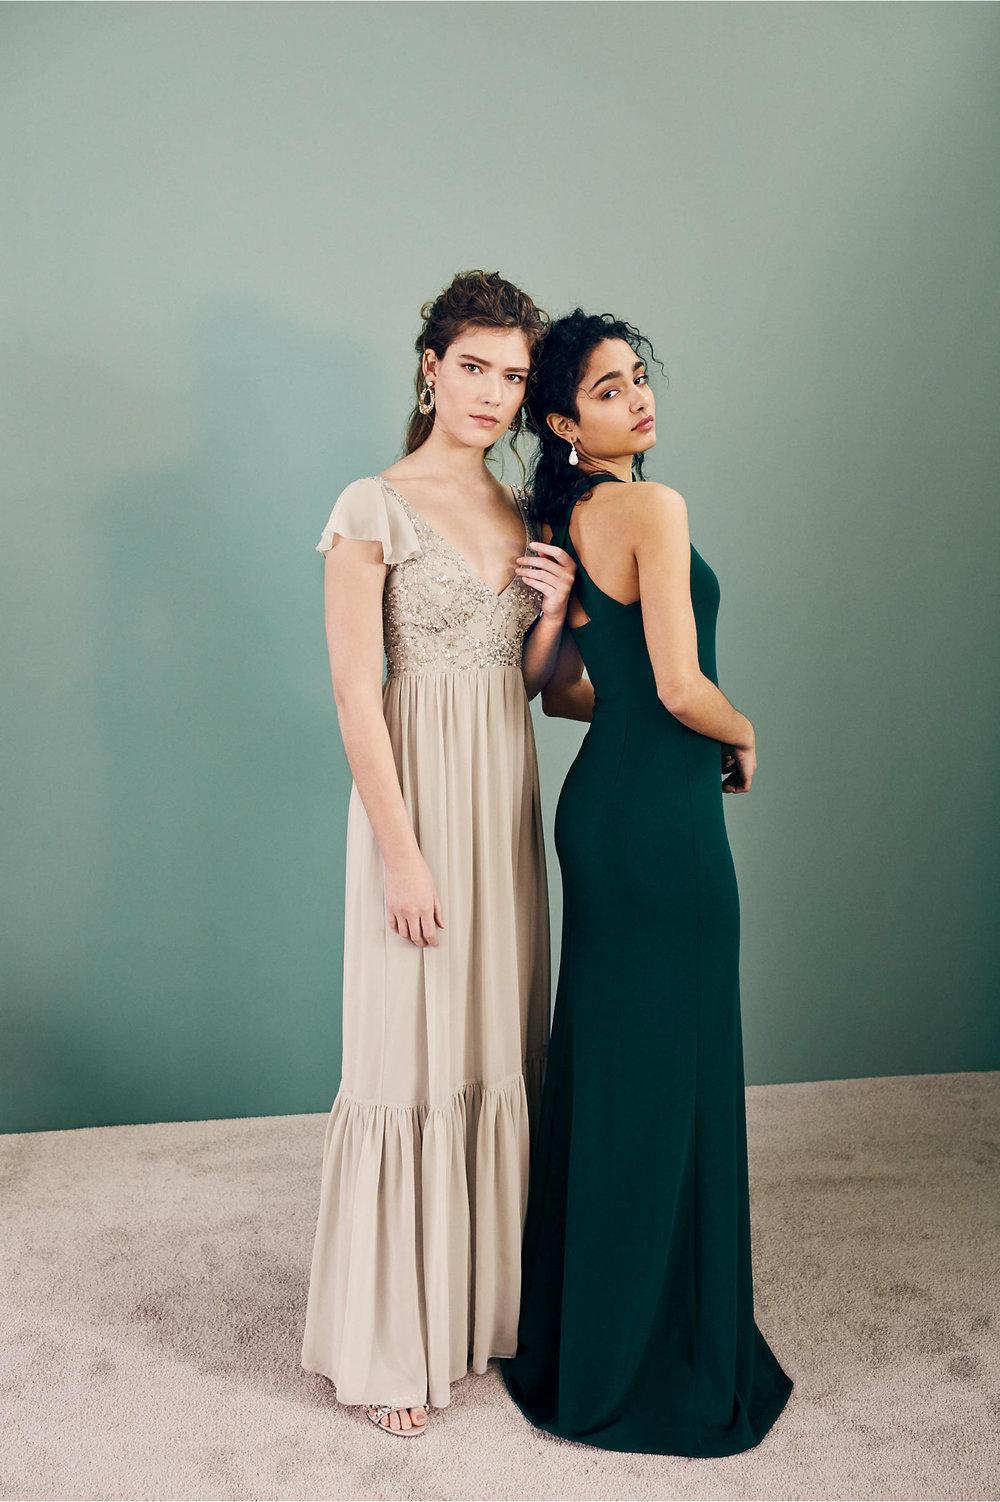 17 Dark and Moody Fall Wedding Dresses from BHLDN Under $400 ...